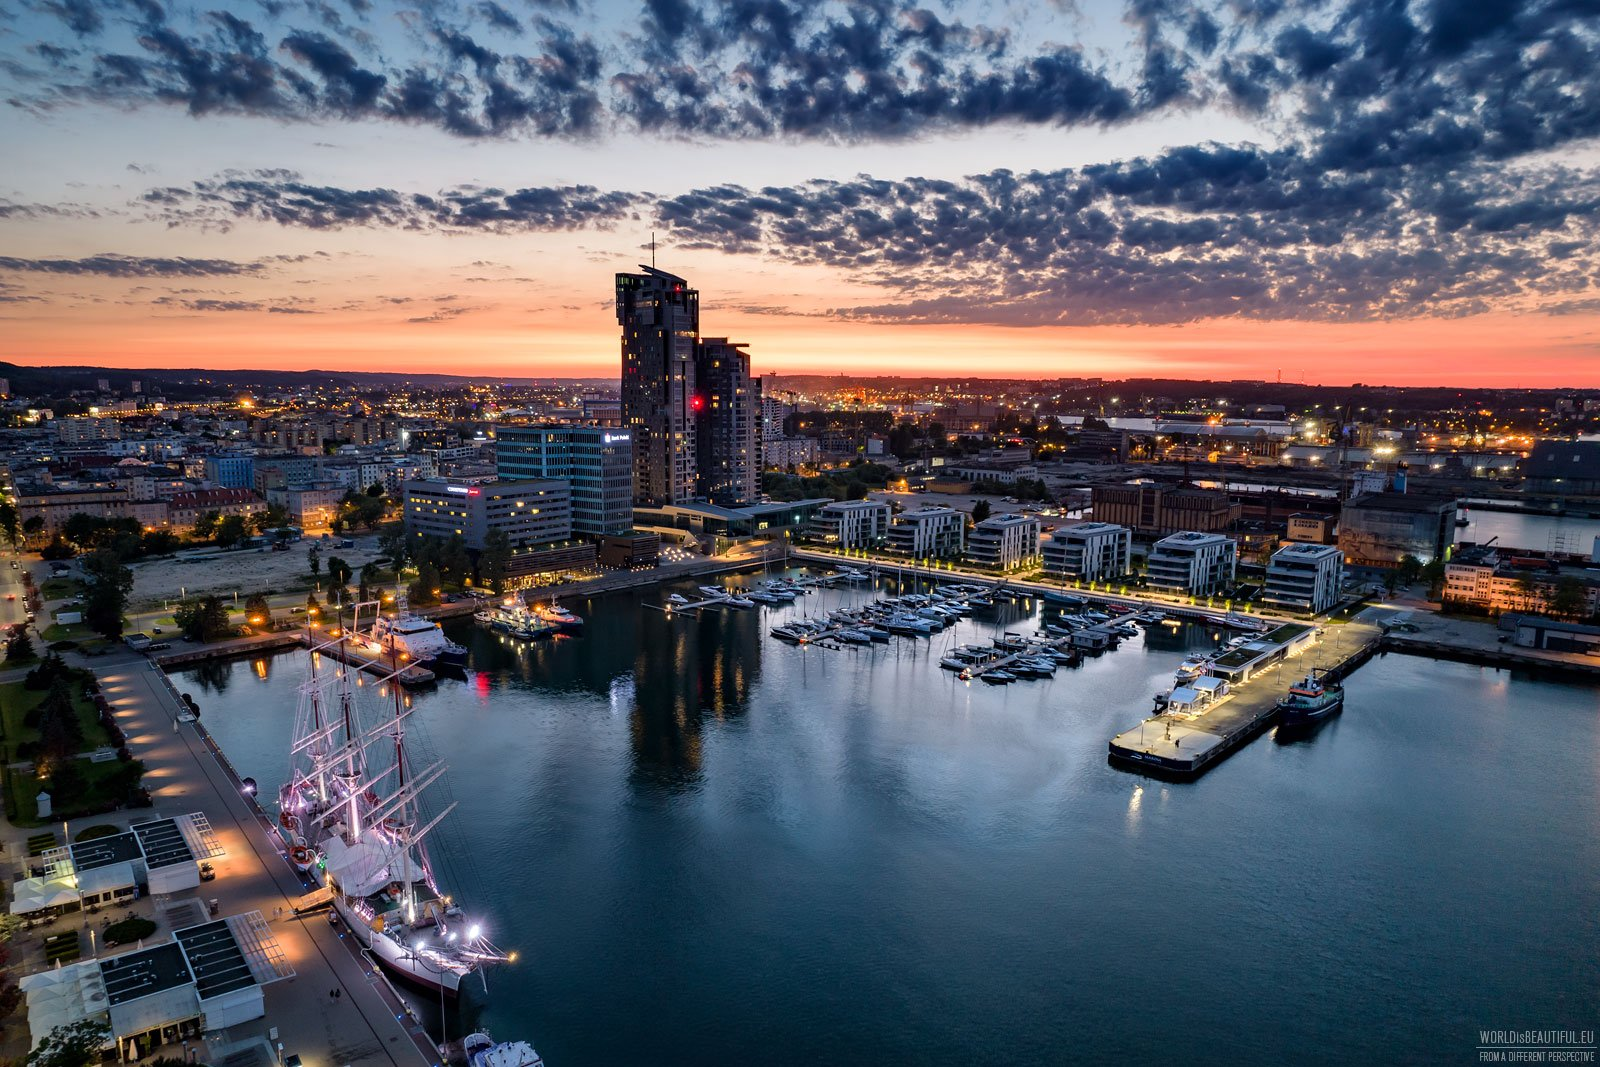 Yacht Park - apartment buildings and marina